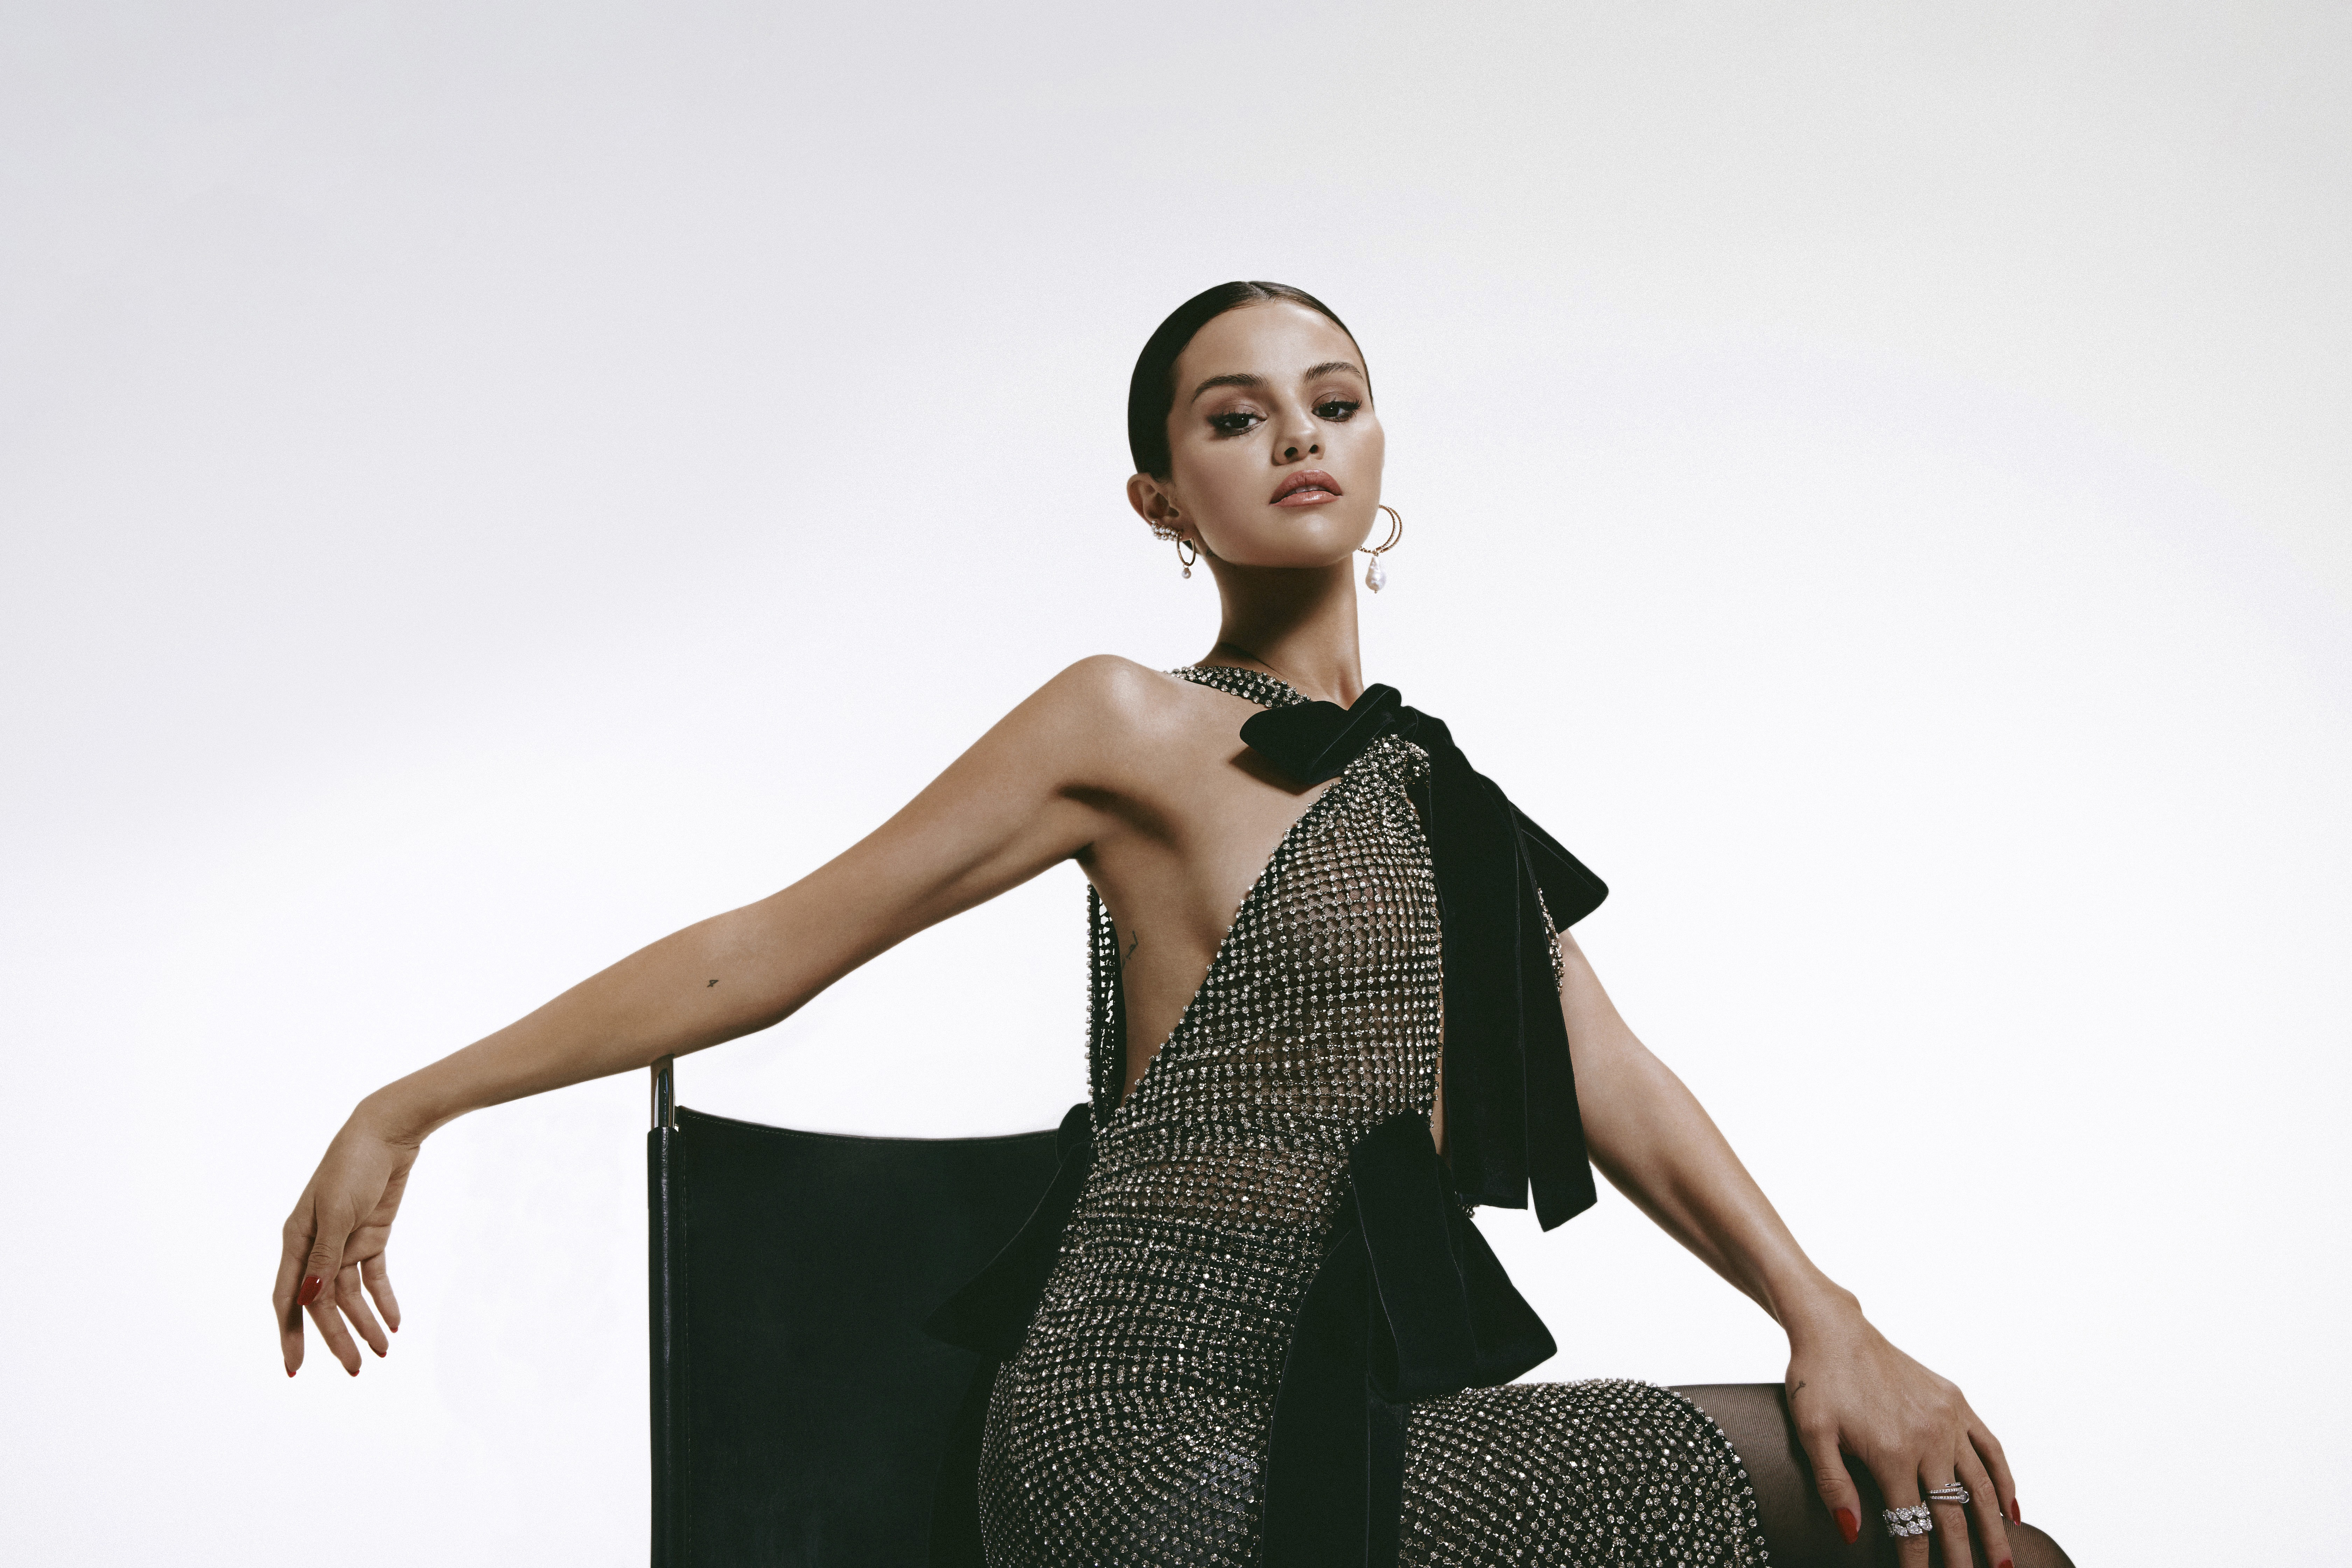 Wallpaper Selena Gomez with elegant dress